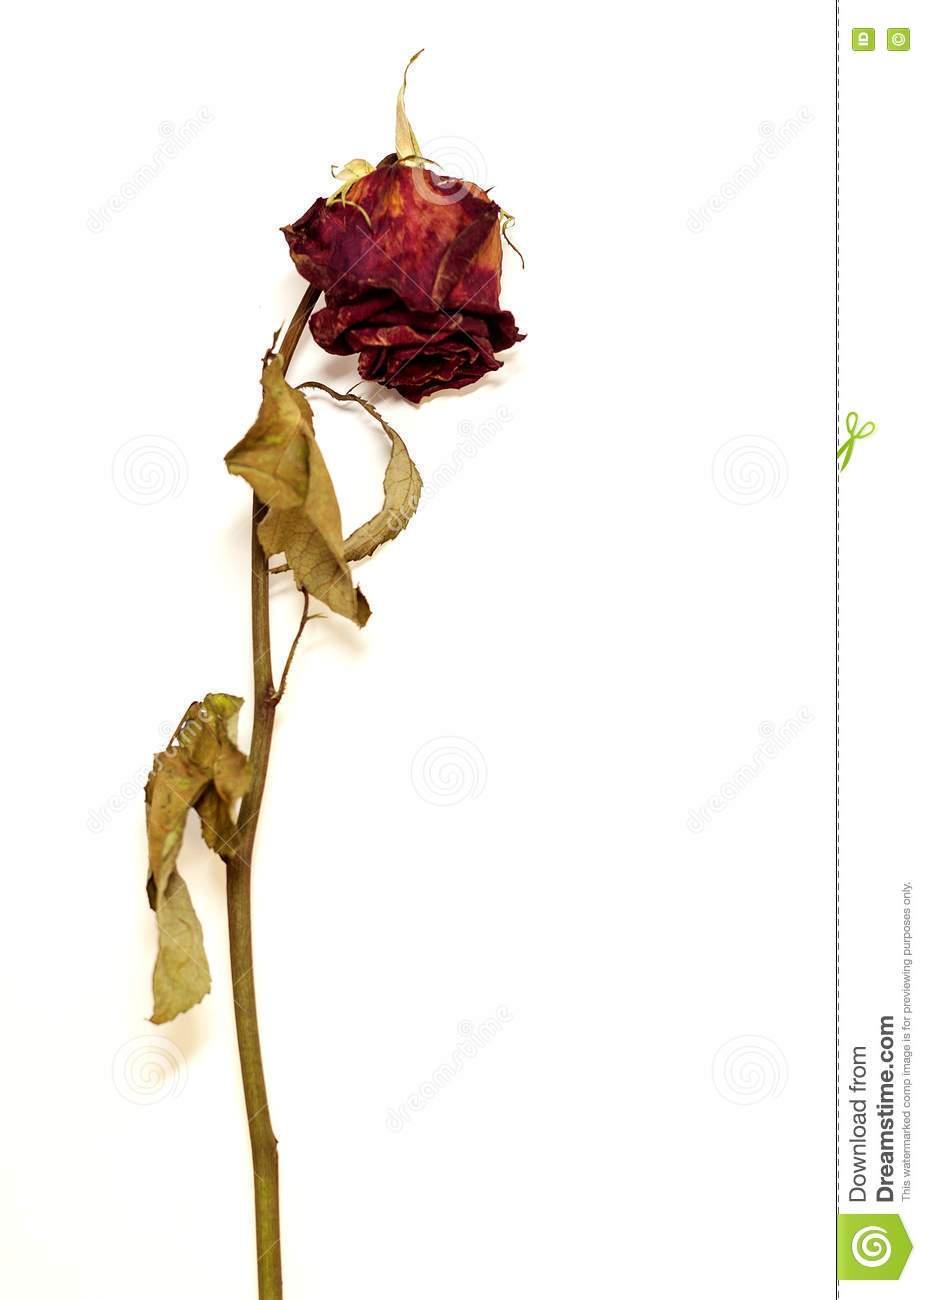 Dead rose clipart 2 » Clipart Portal.